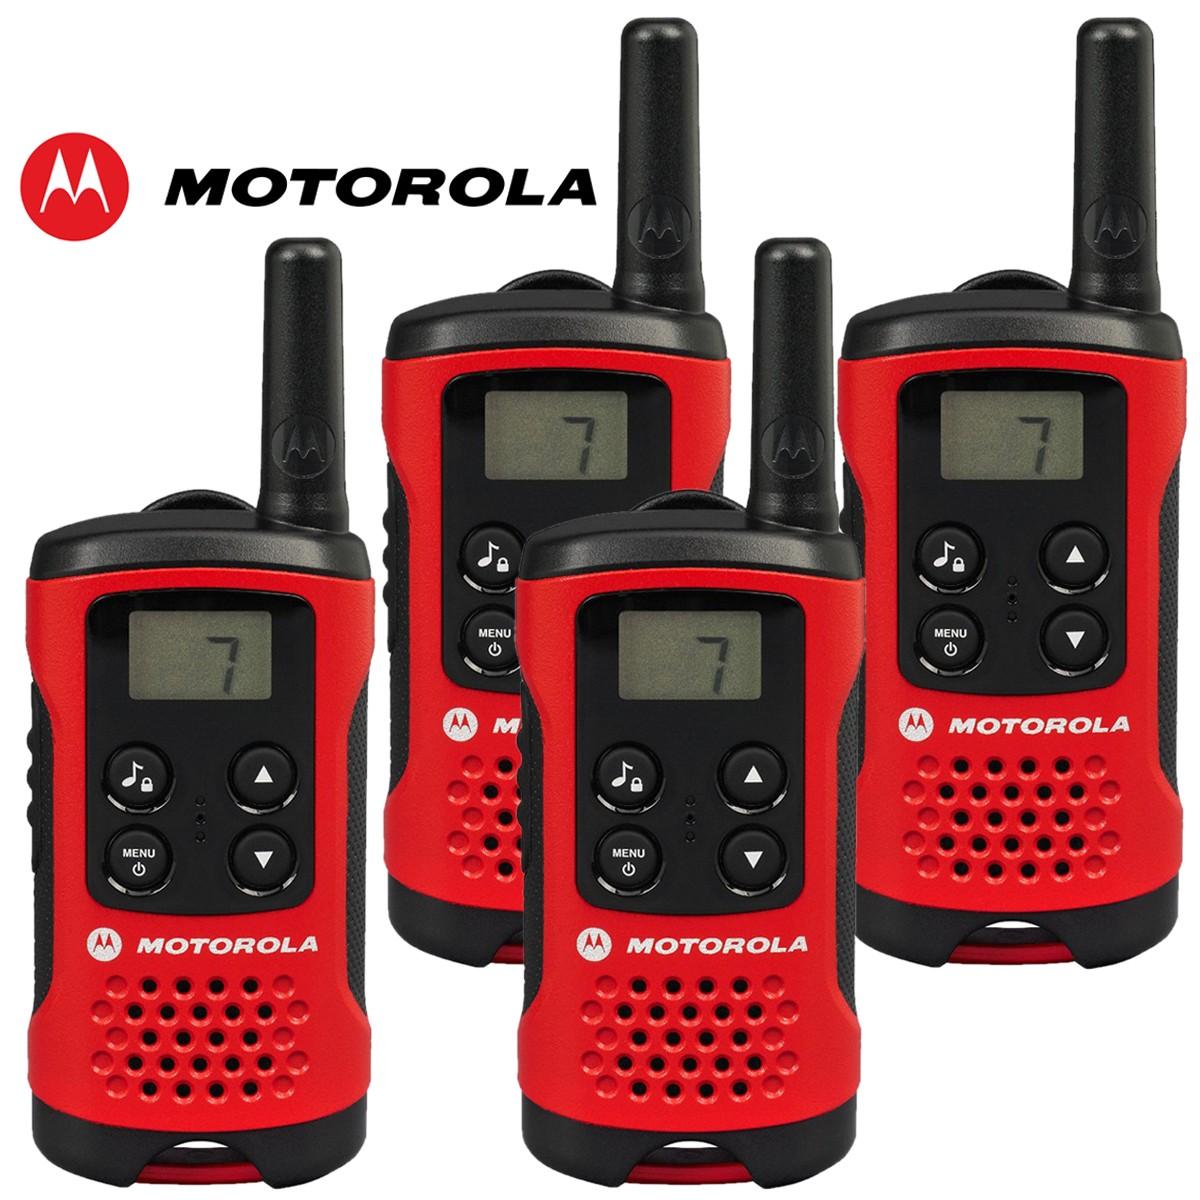 tlkr t40 walkie talkie compact tough phones. Black Bedroom Furniture Sets. Home Design Ideas